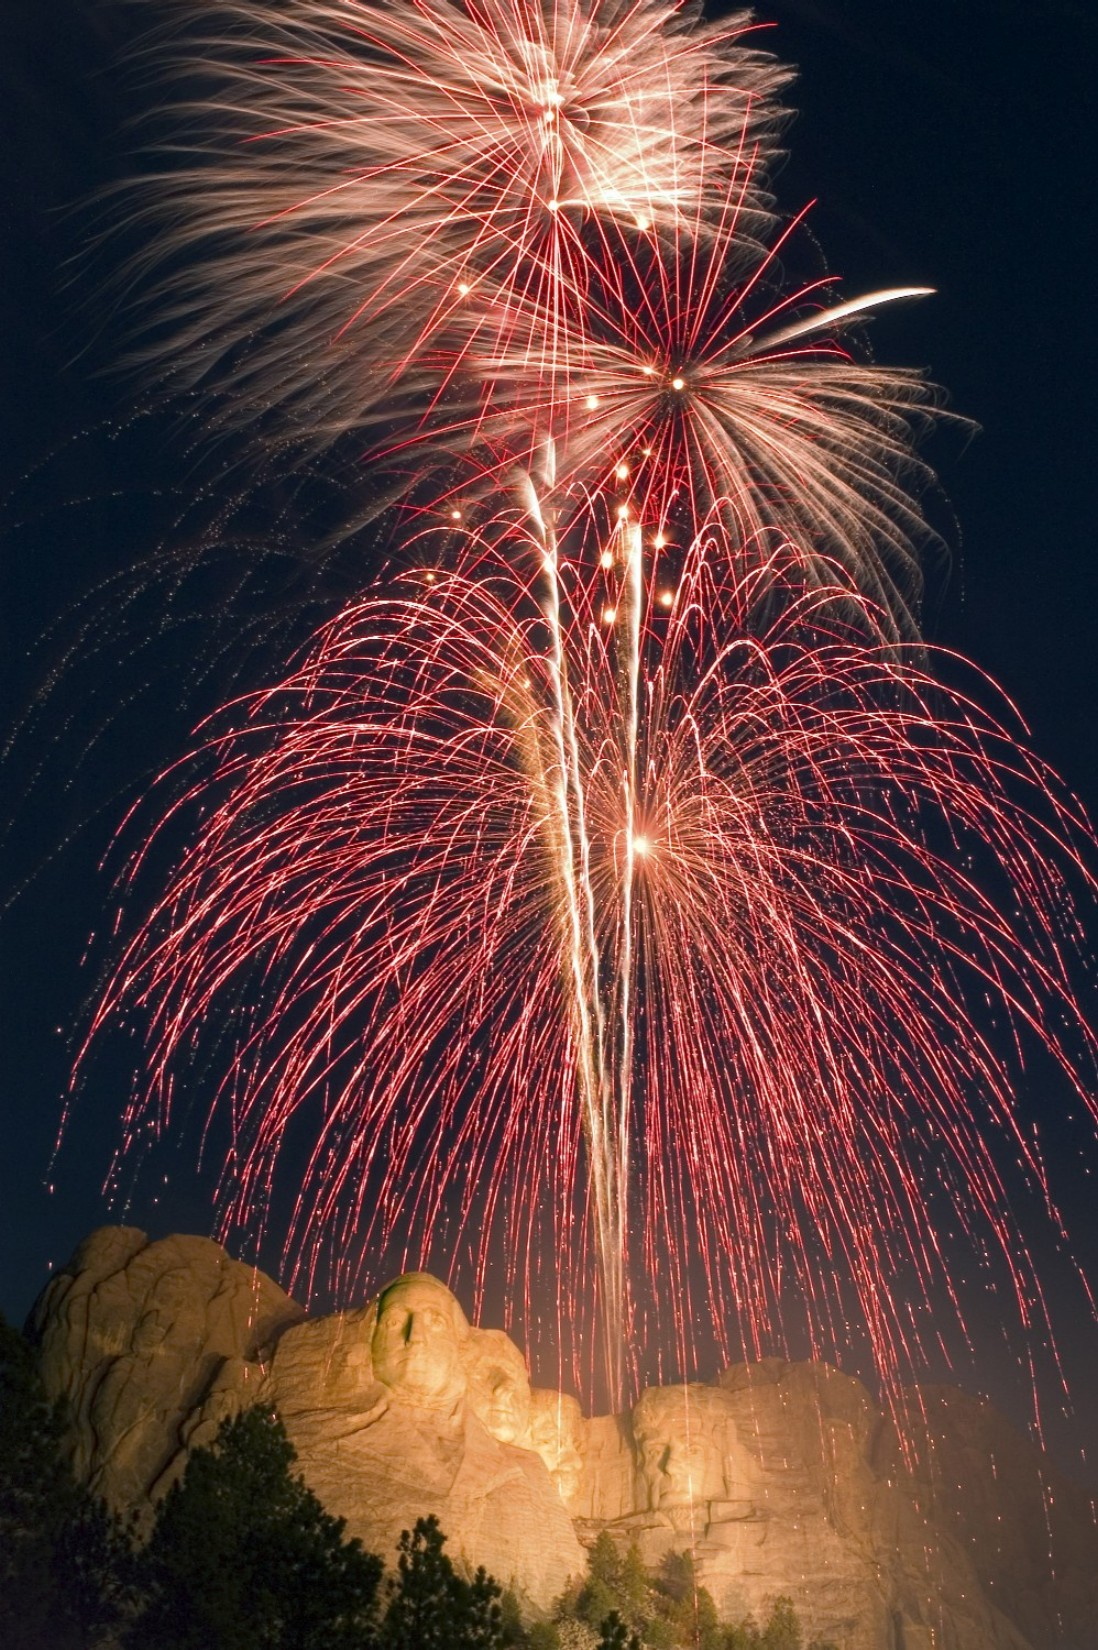 Mount Rushmore Fireworks To Kick Off American Celebration